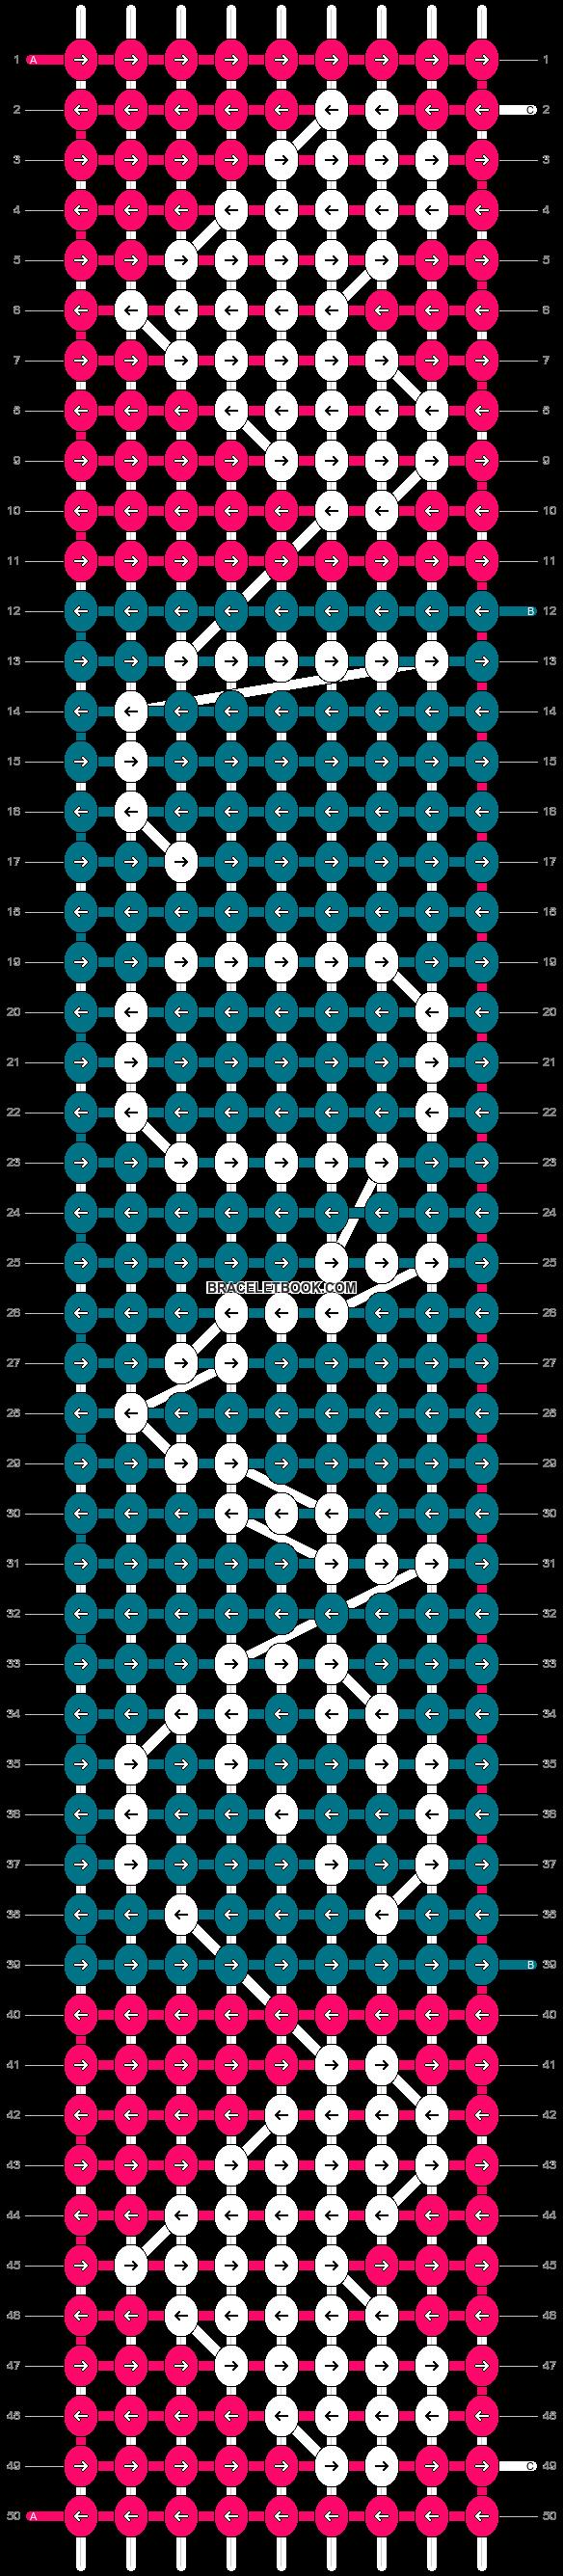 Alpha pattern #10161 pattern